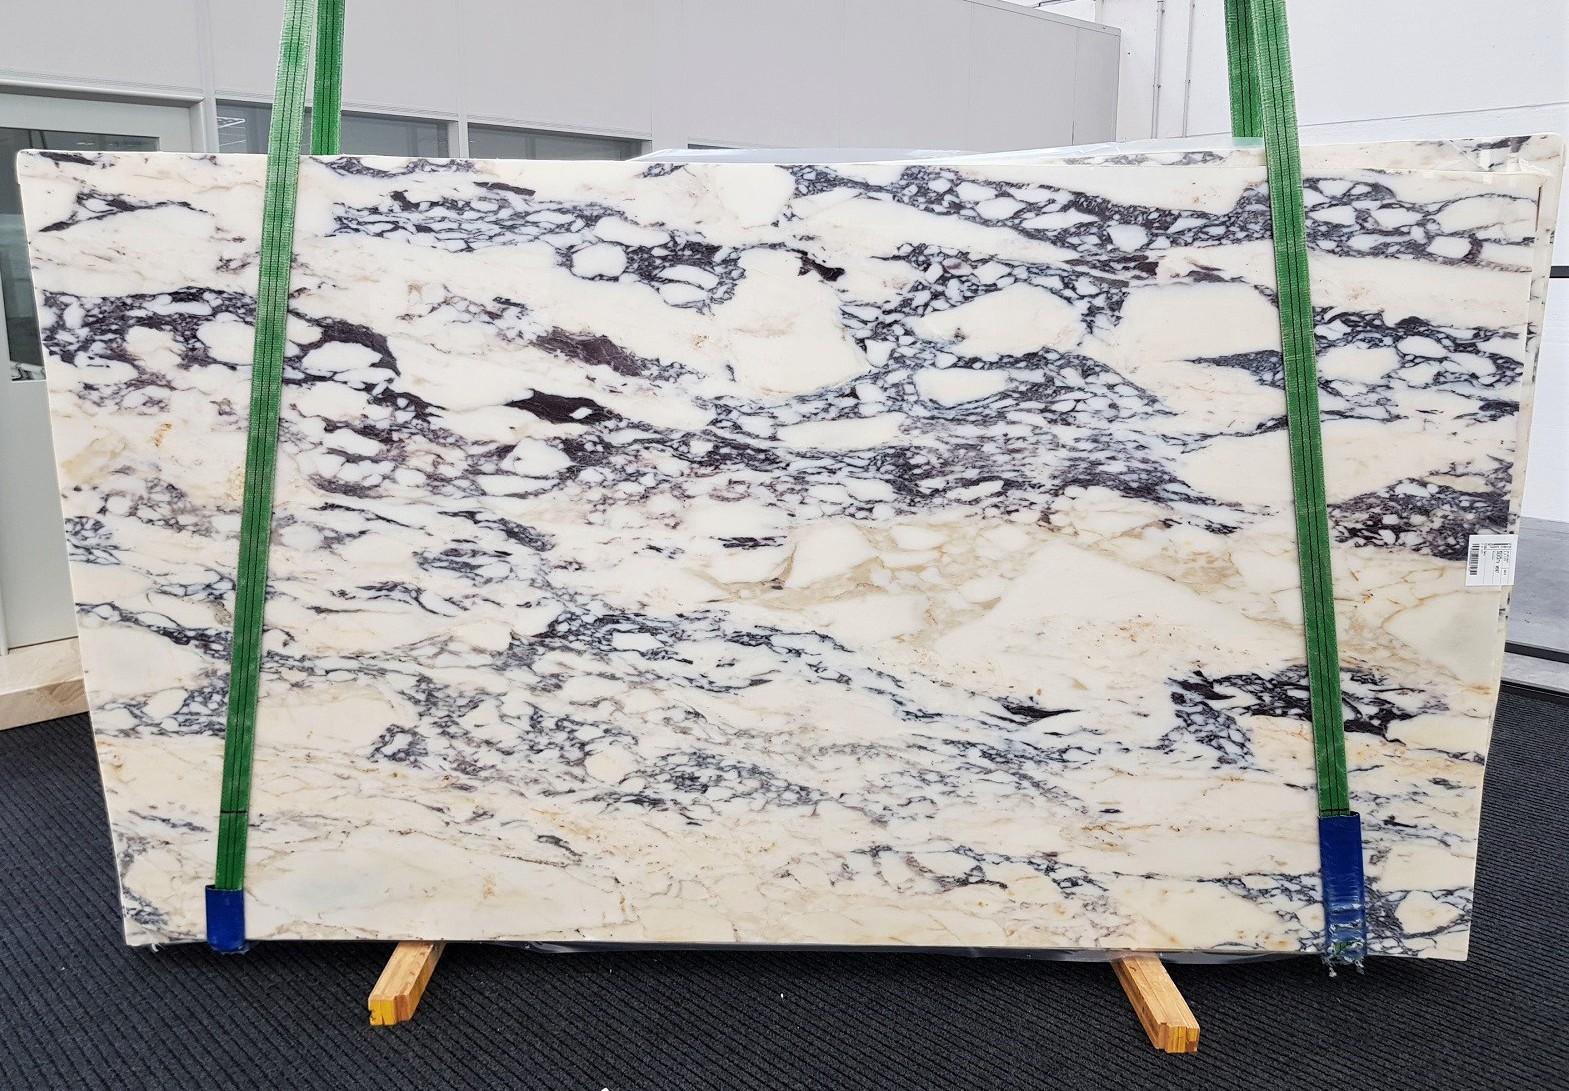 CALACATTA MONET Fourniture Veneto (Italie) d' dalles brillantes en marbre naturel 1371 , Slab #51